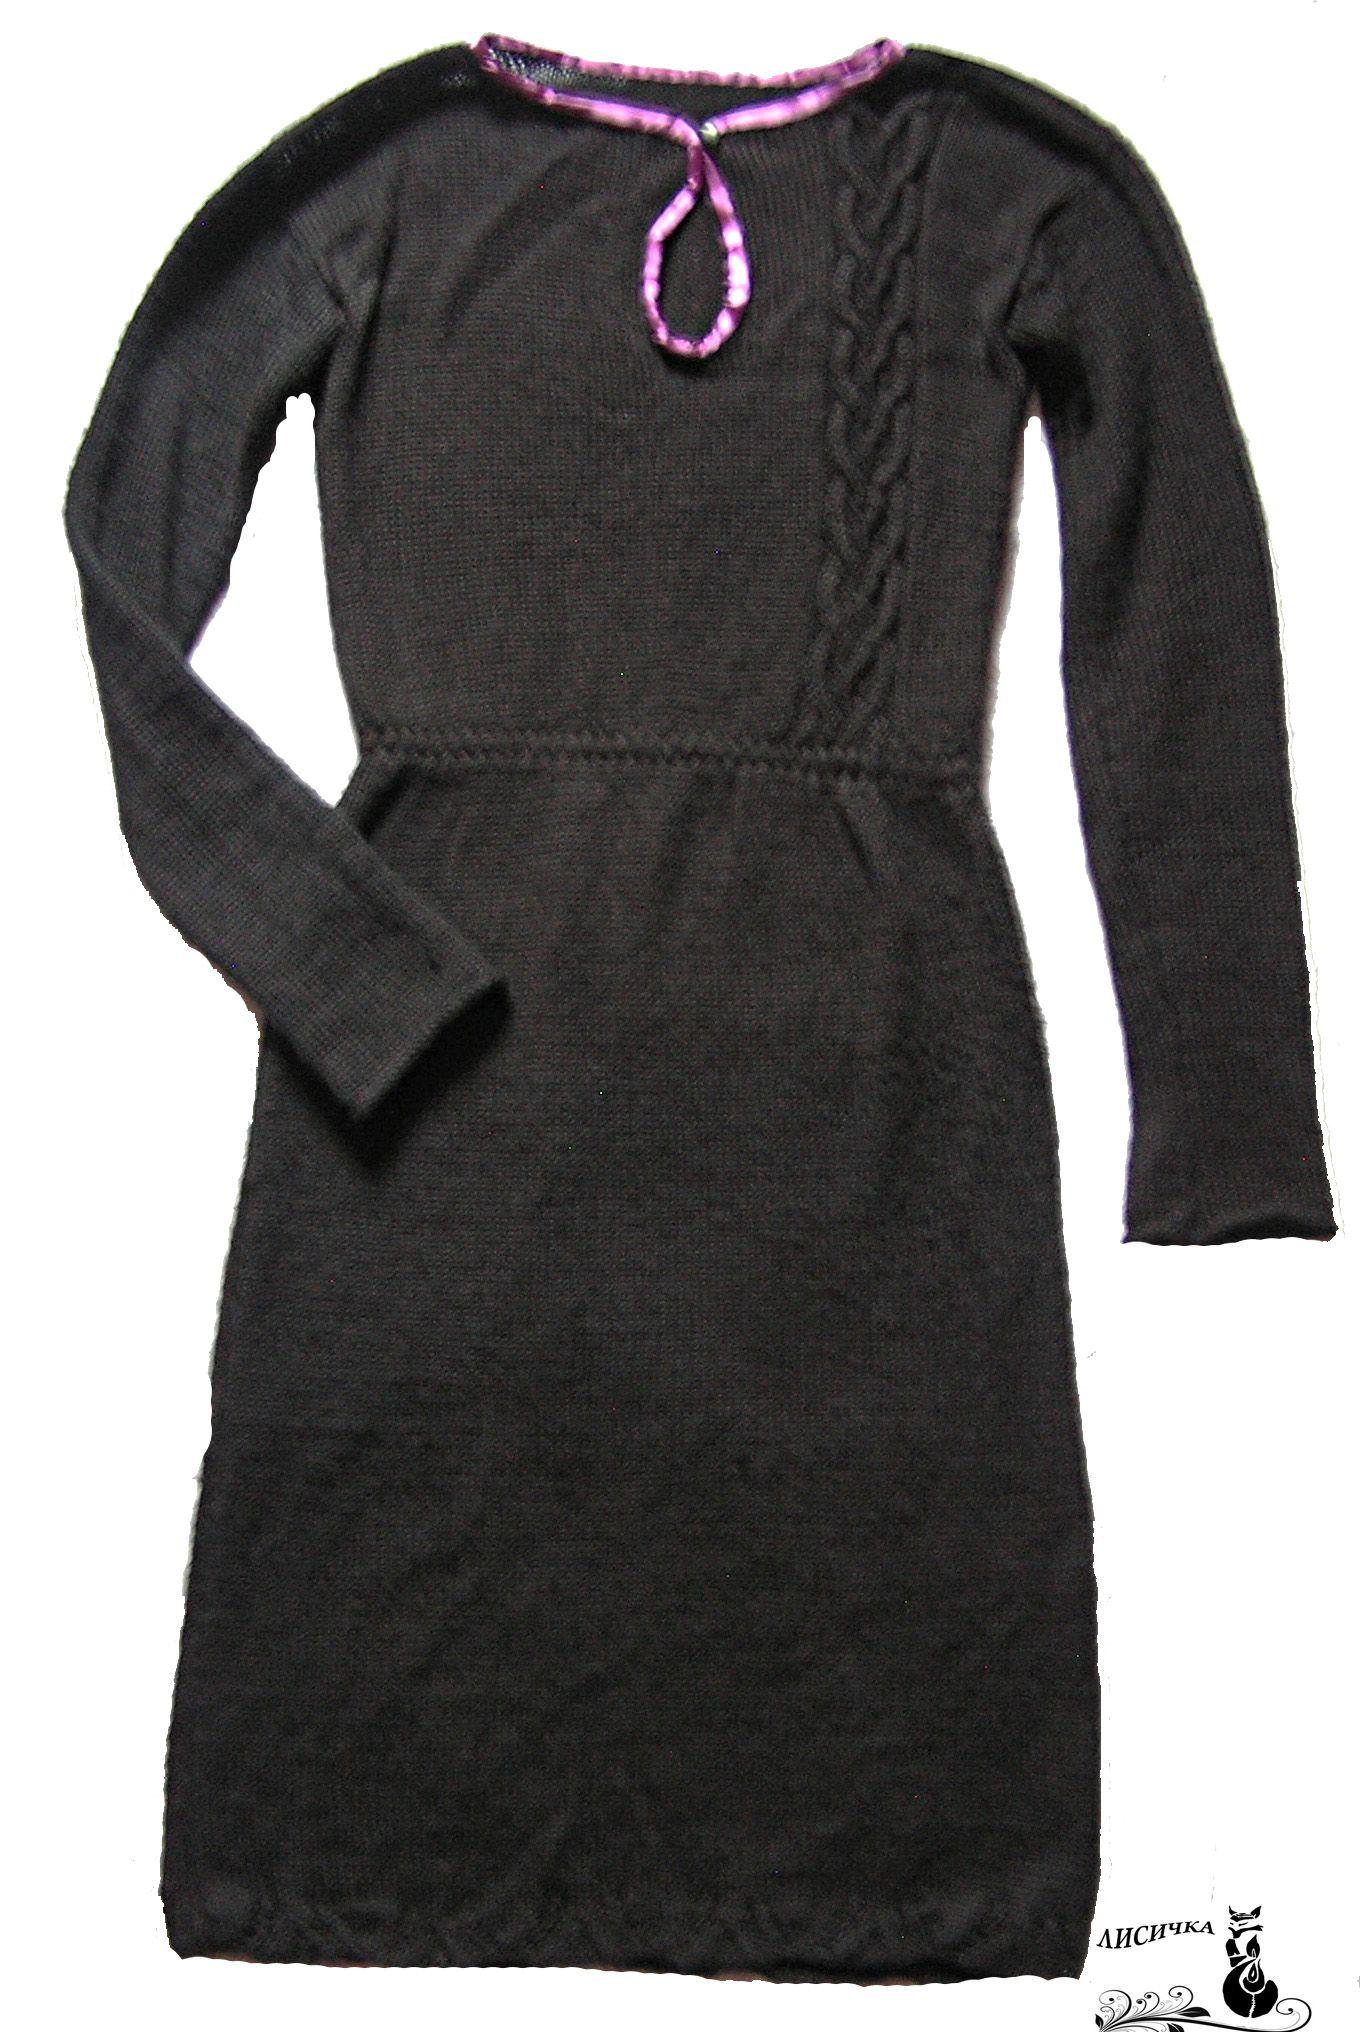 dress clothes winter knitting black